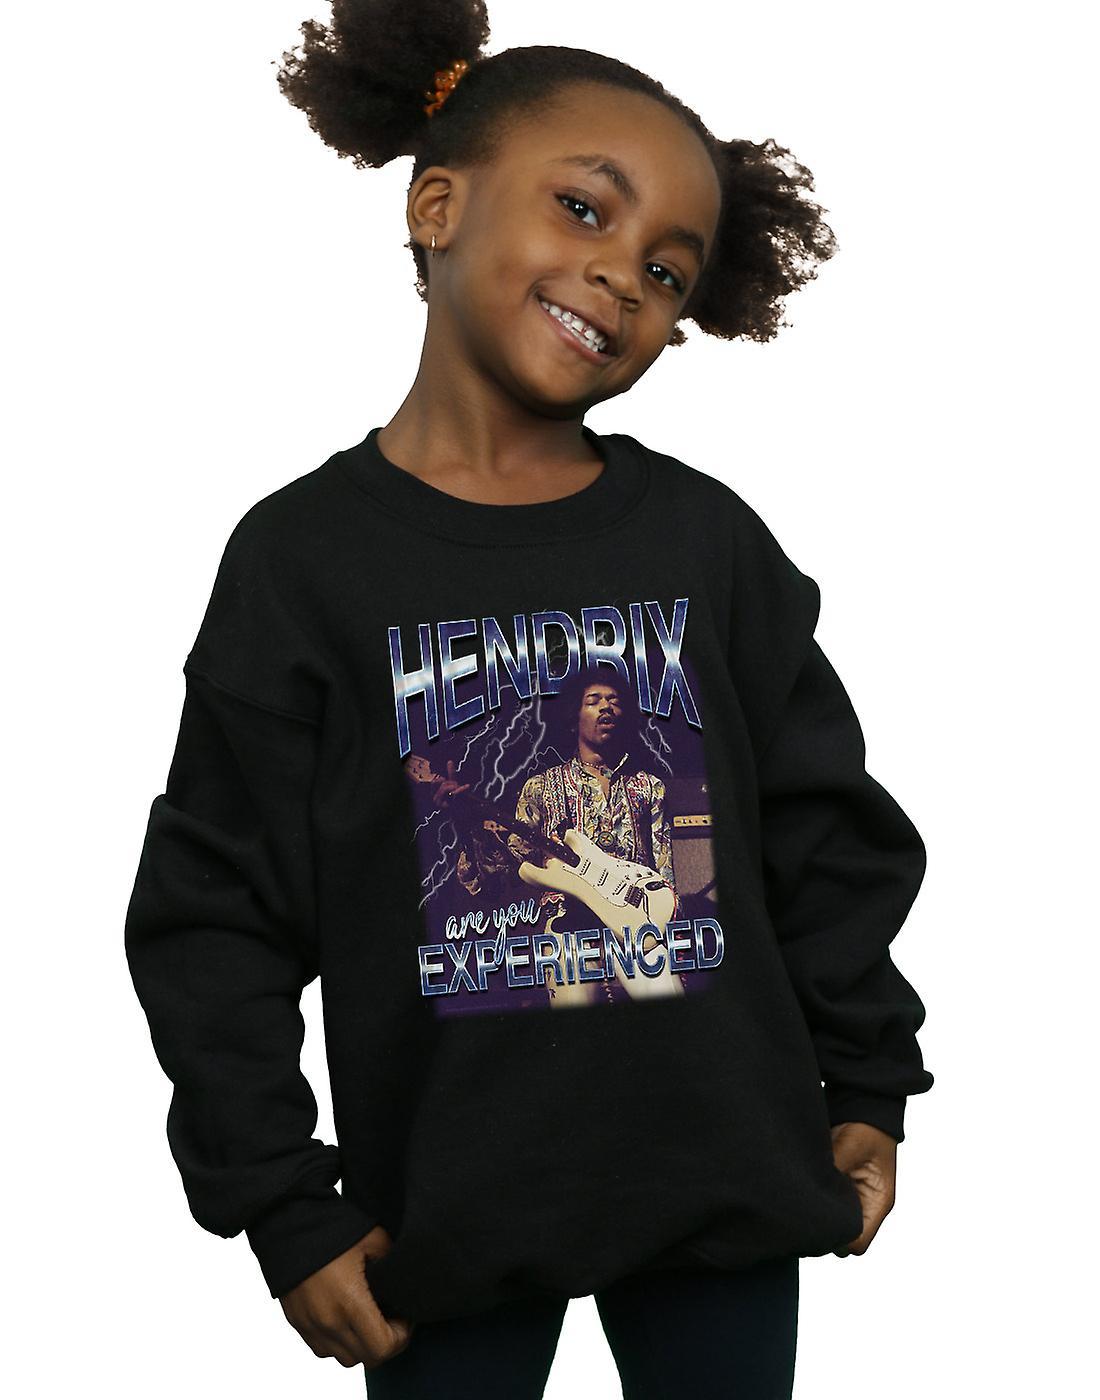 Jimi Hendrix Girls Lightning Experience Sweatshirt